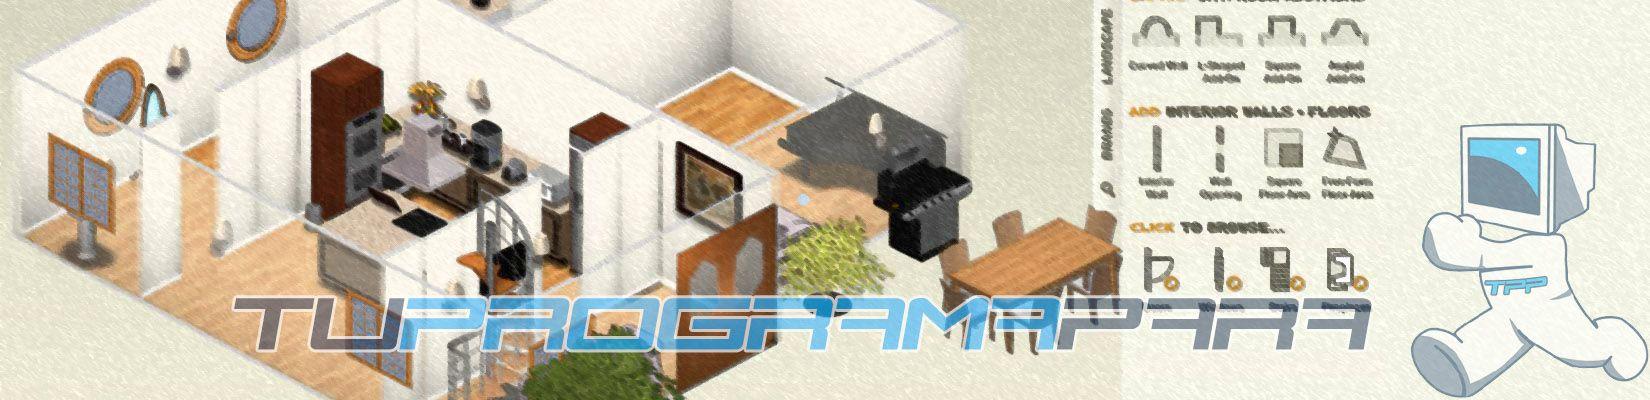 programa para diseñar casas